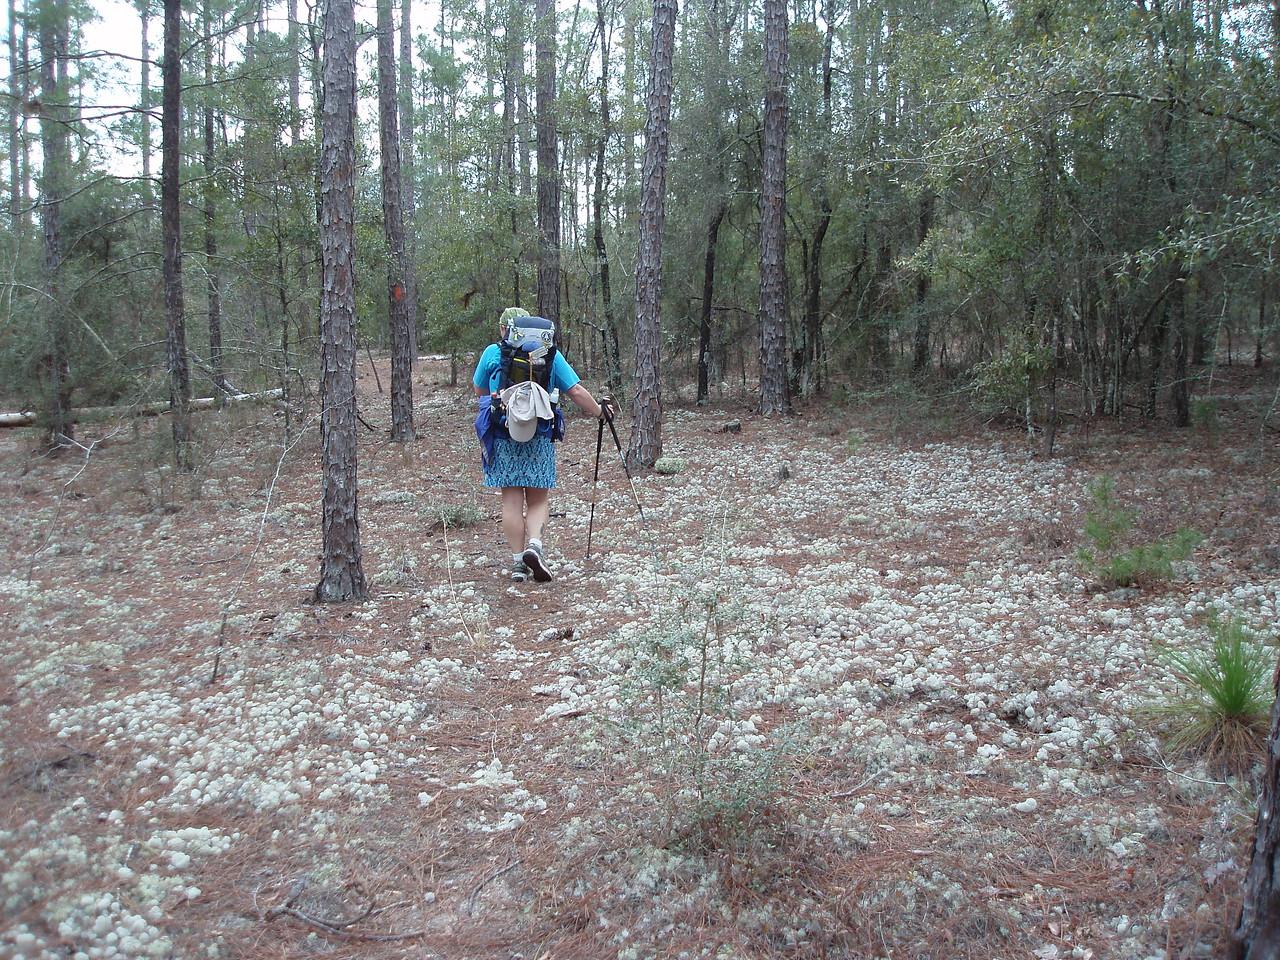 Hiking the Florida Trail, Eglin AFB<br /> PHOTO CREDIT: Robert Coveney / Florida Trail Association